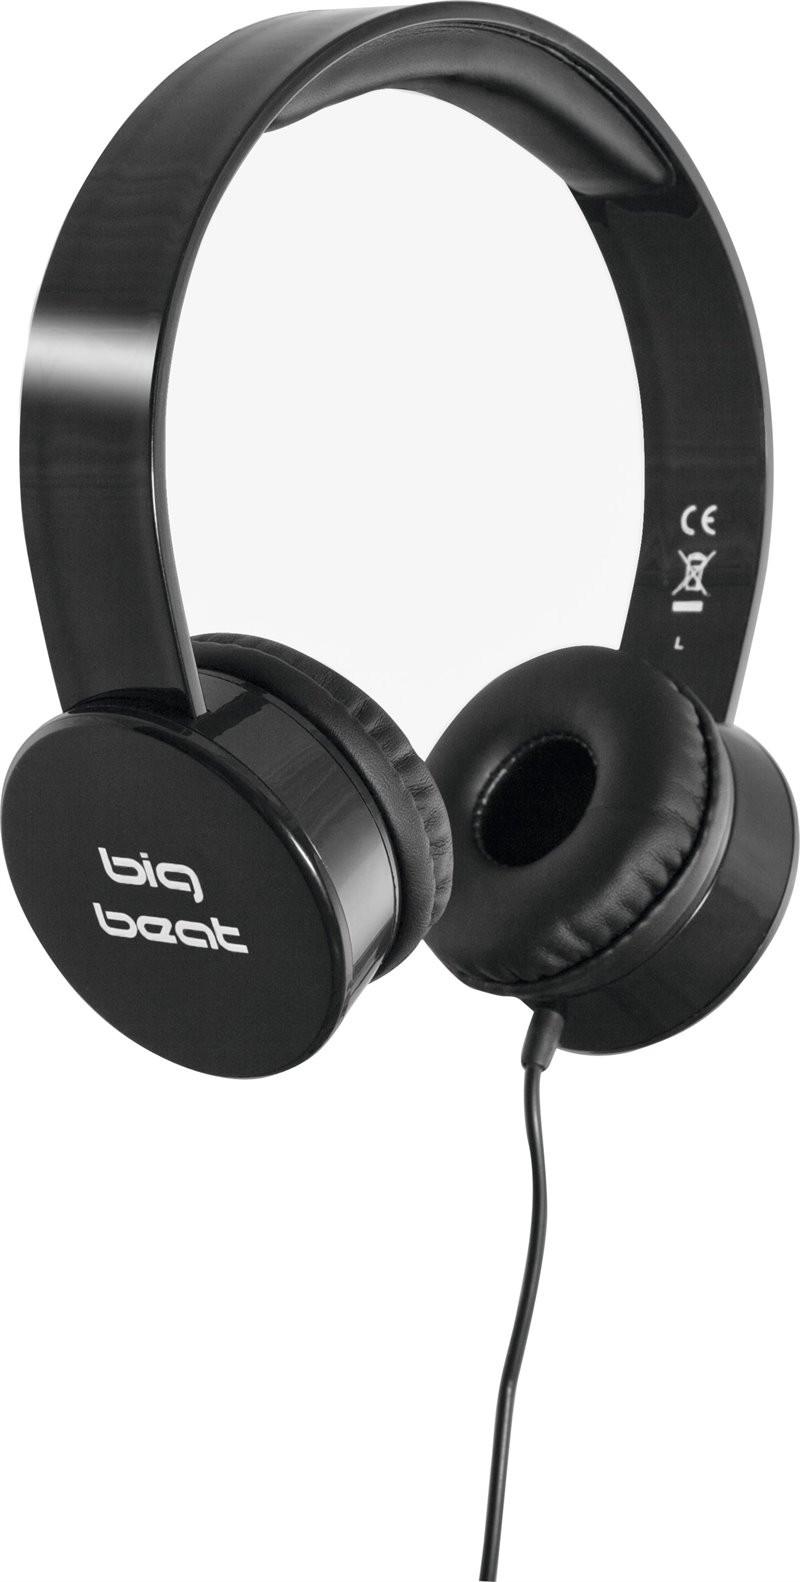 Słuchawki stereo BigBeat CE...